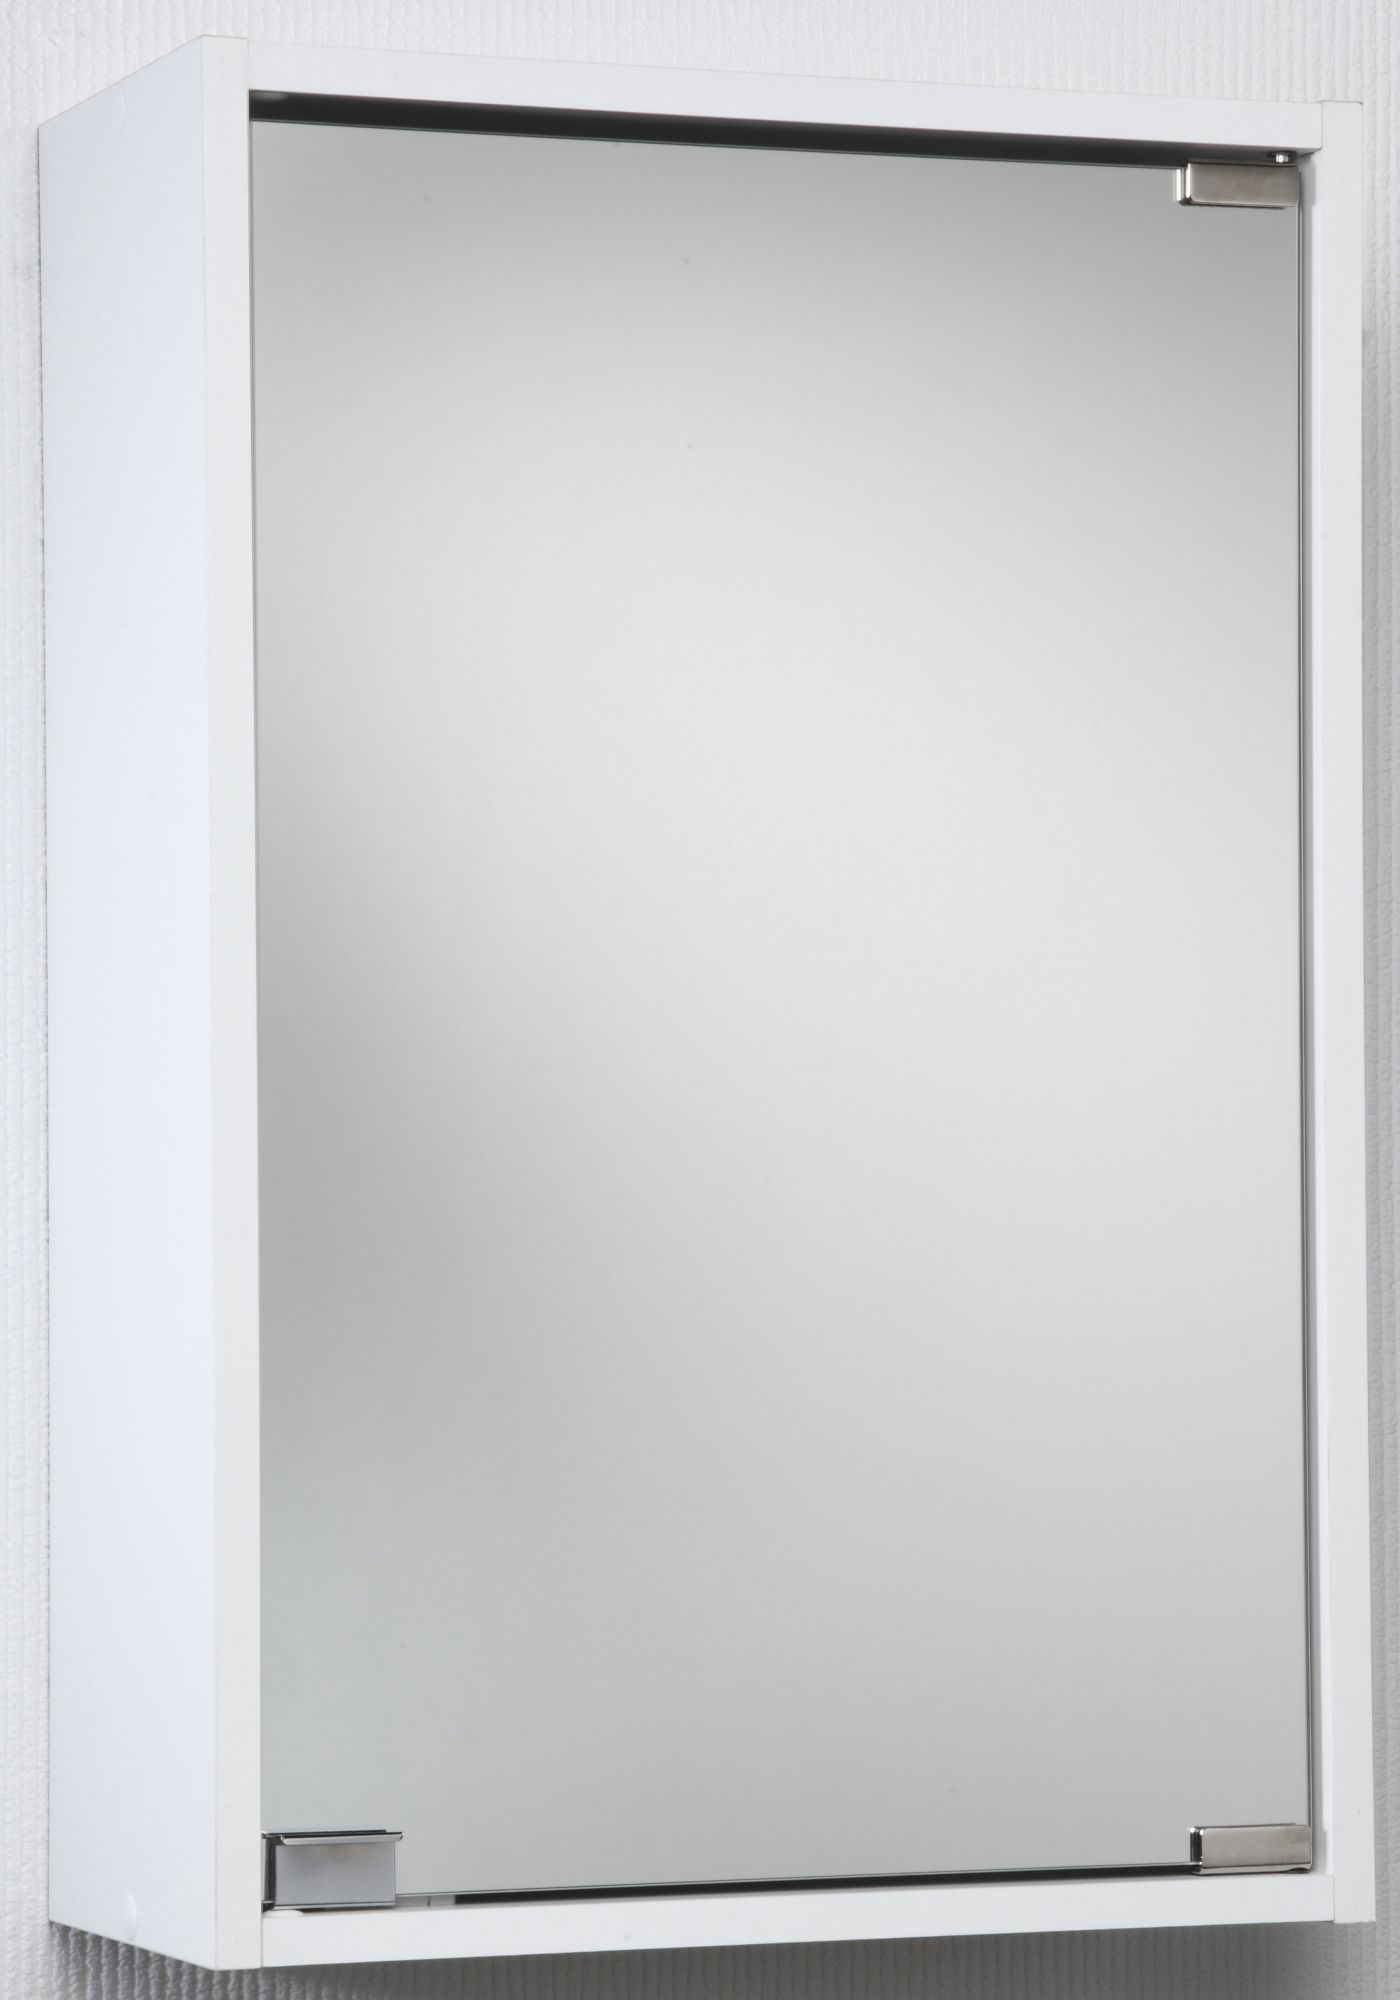 kesper spiegelschrank brixen 1 t rig schwab versand. Black Bedroom Furniture Sets. Home Design Ideas